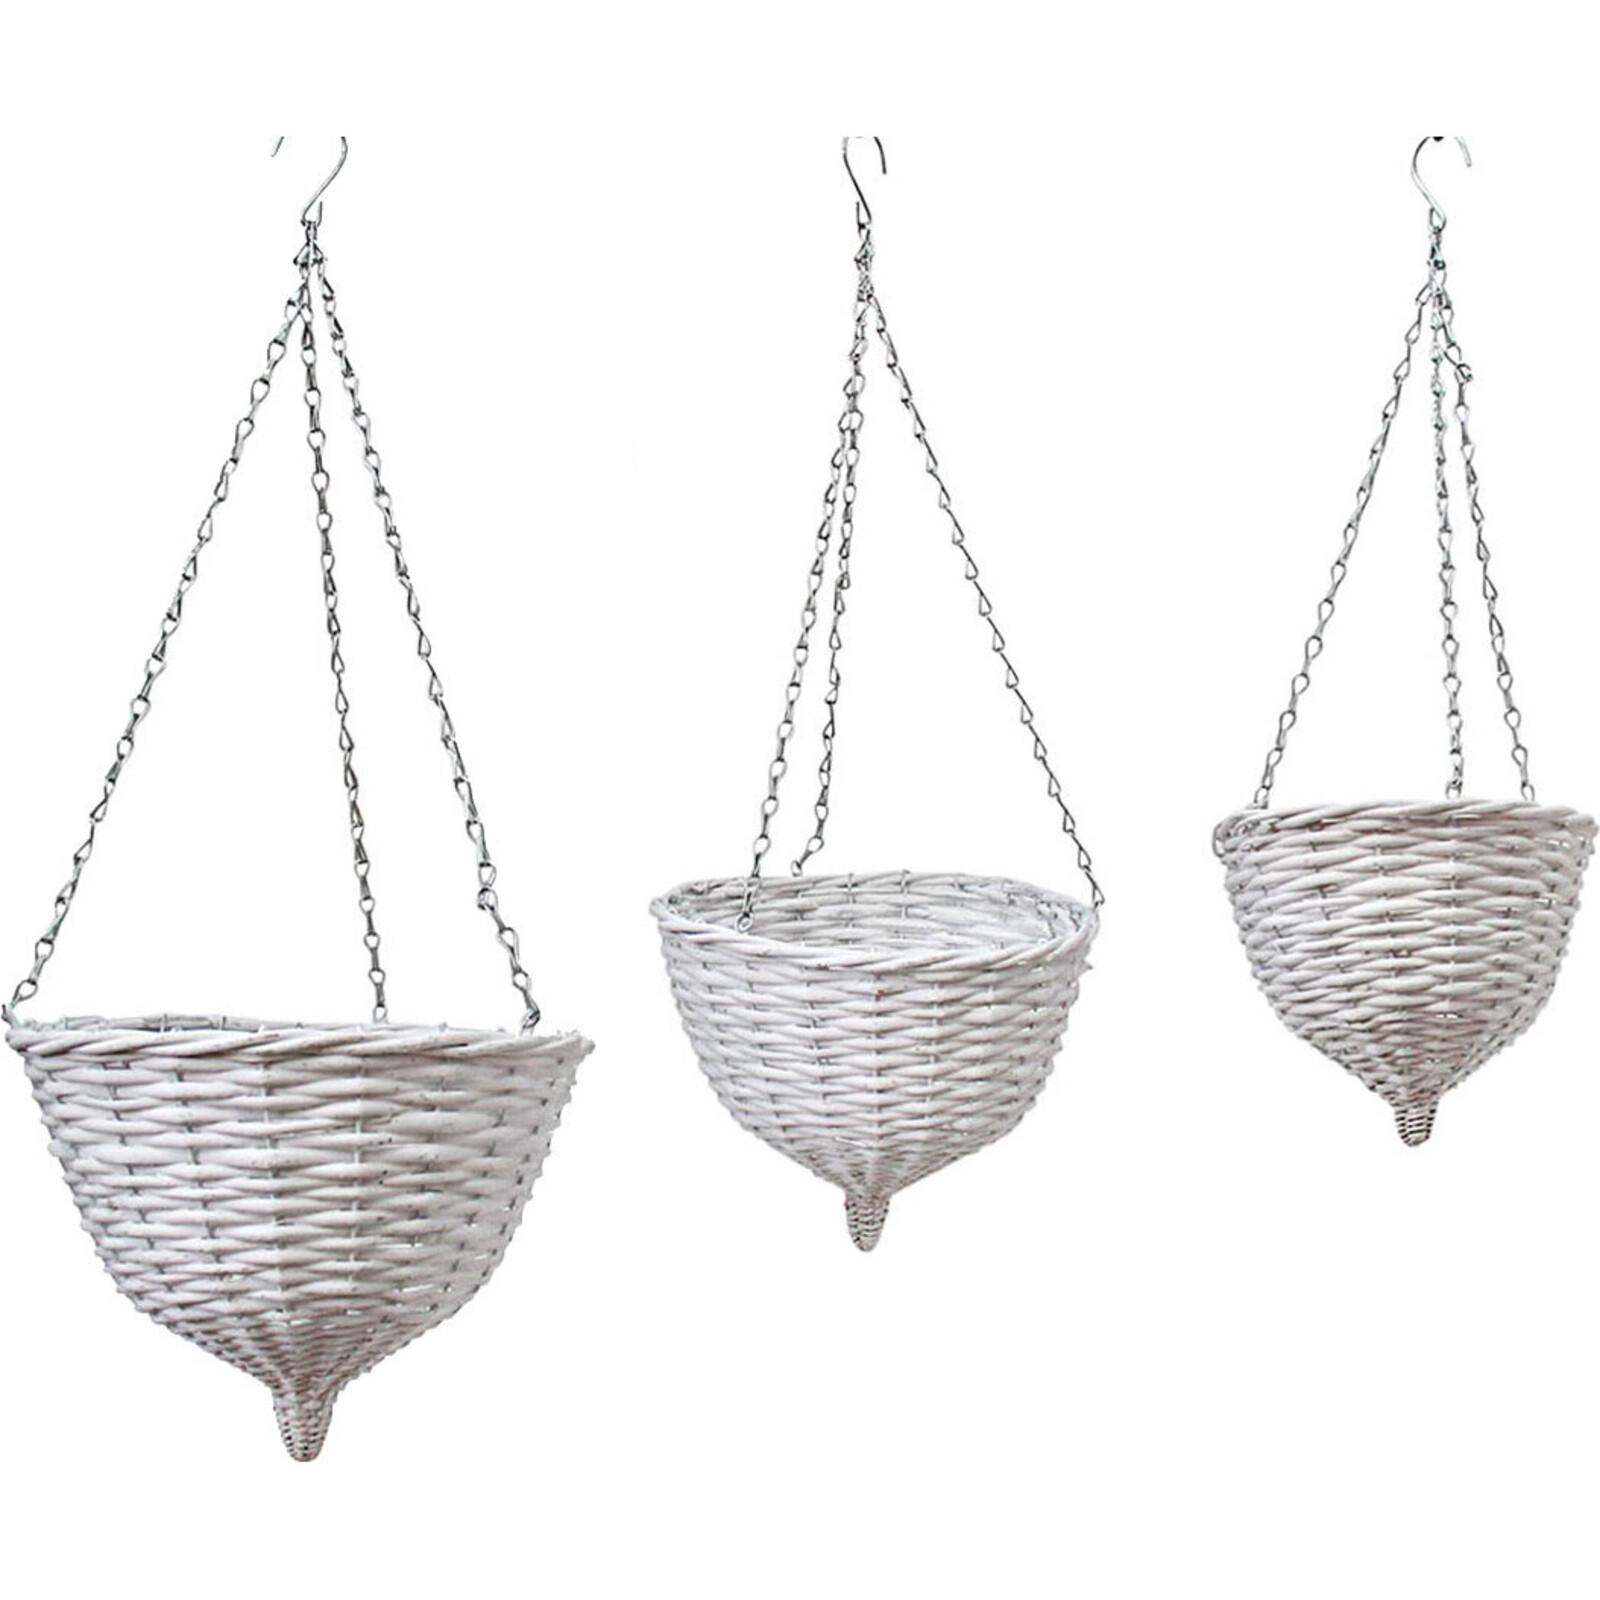 Hanging Basket S/3 Pointe